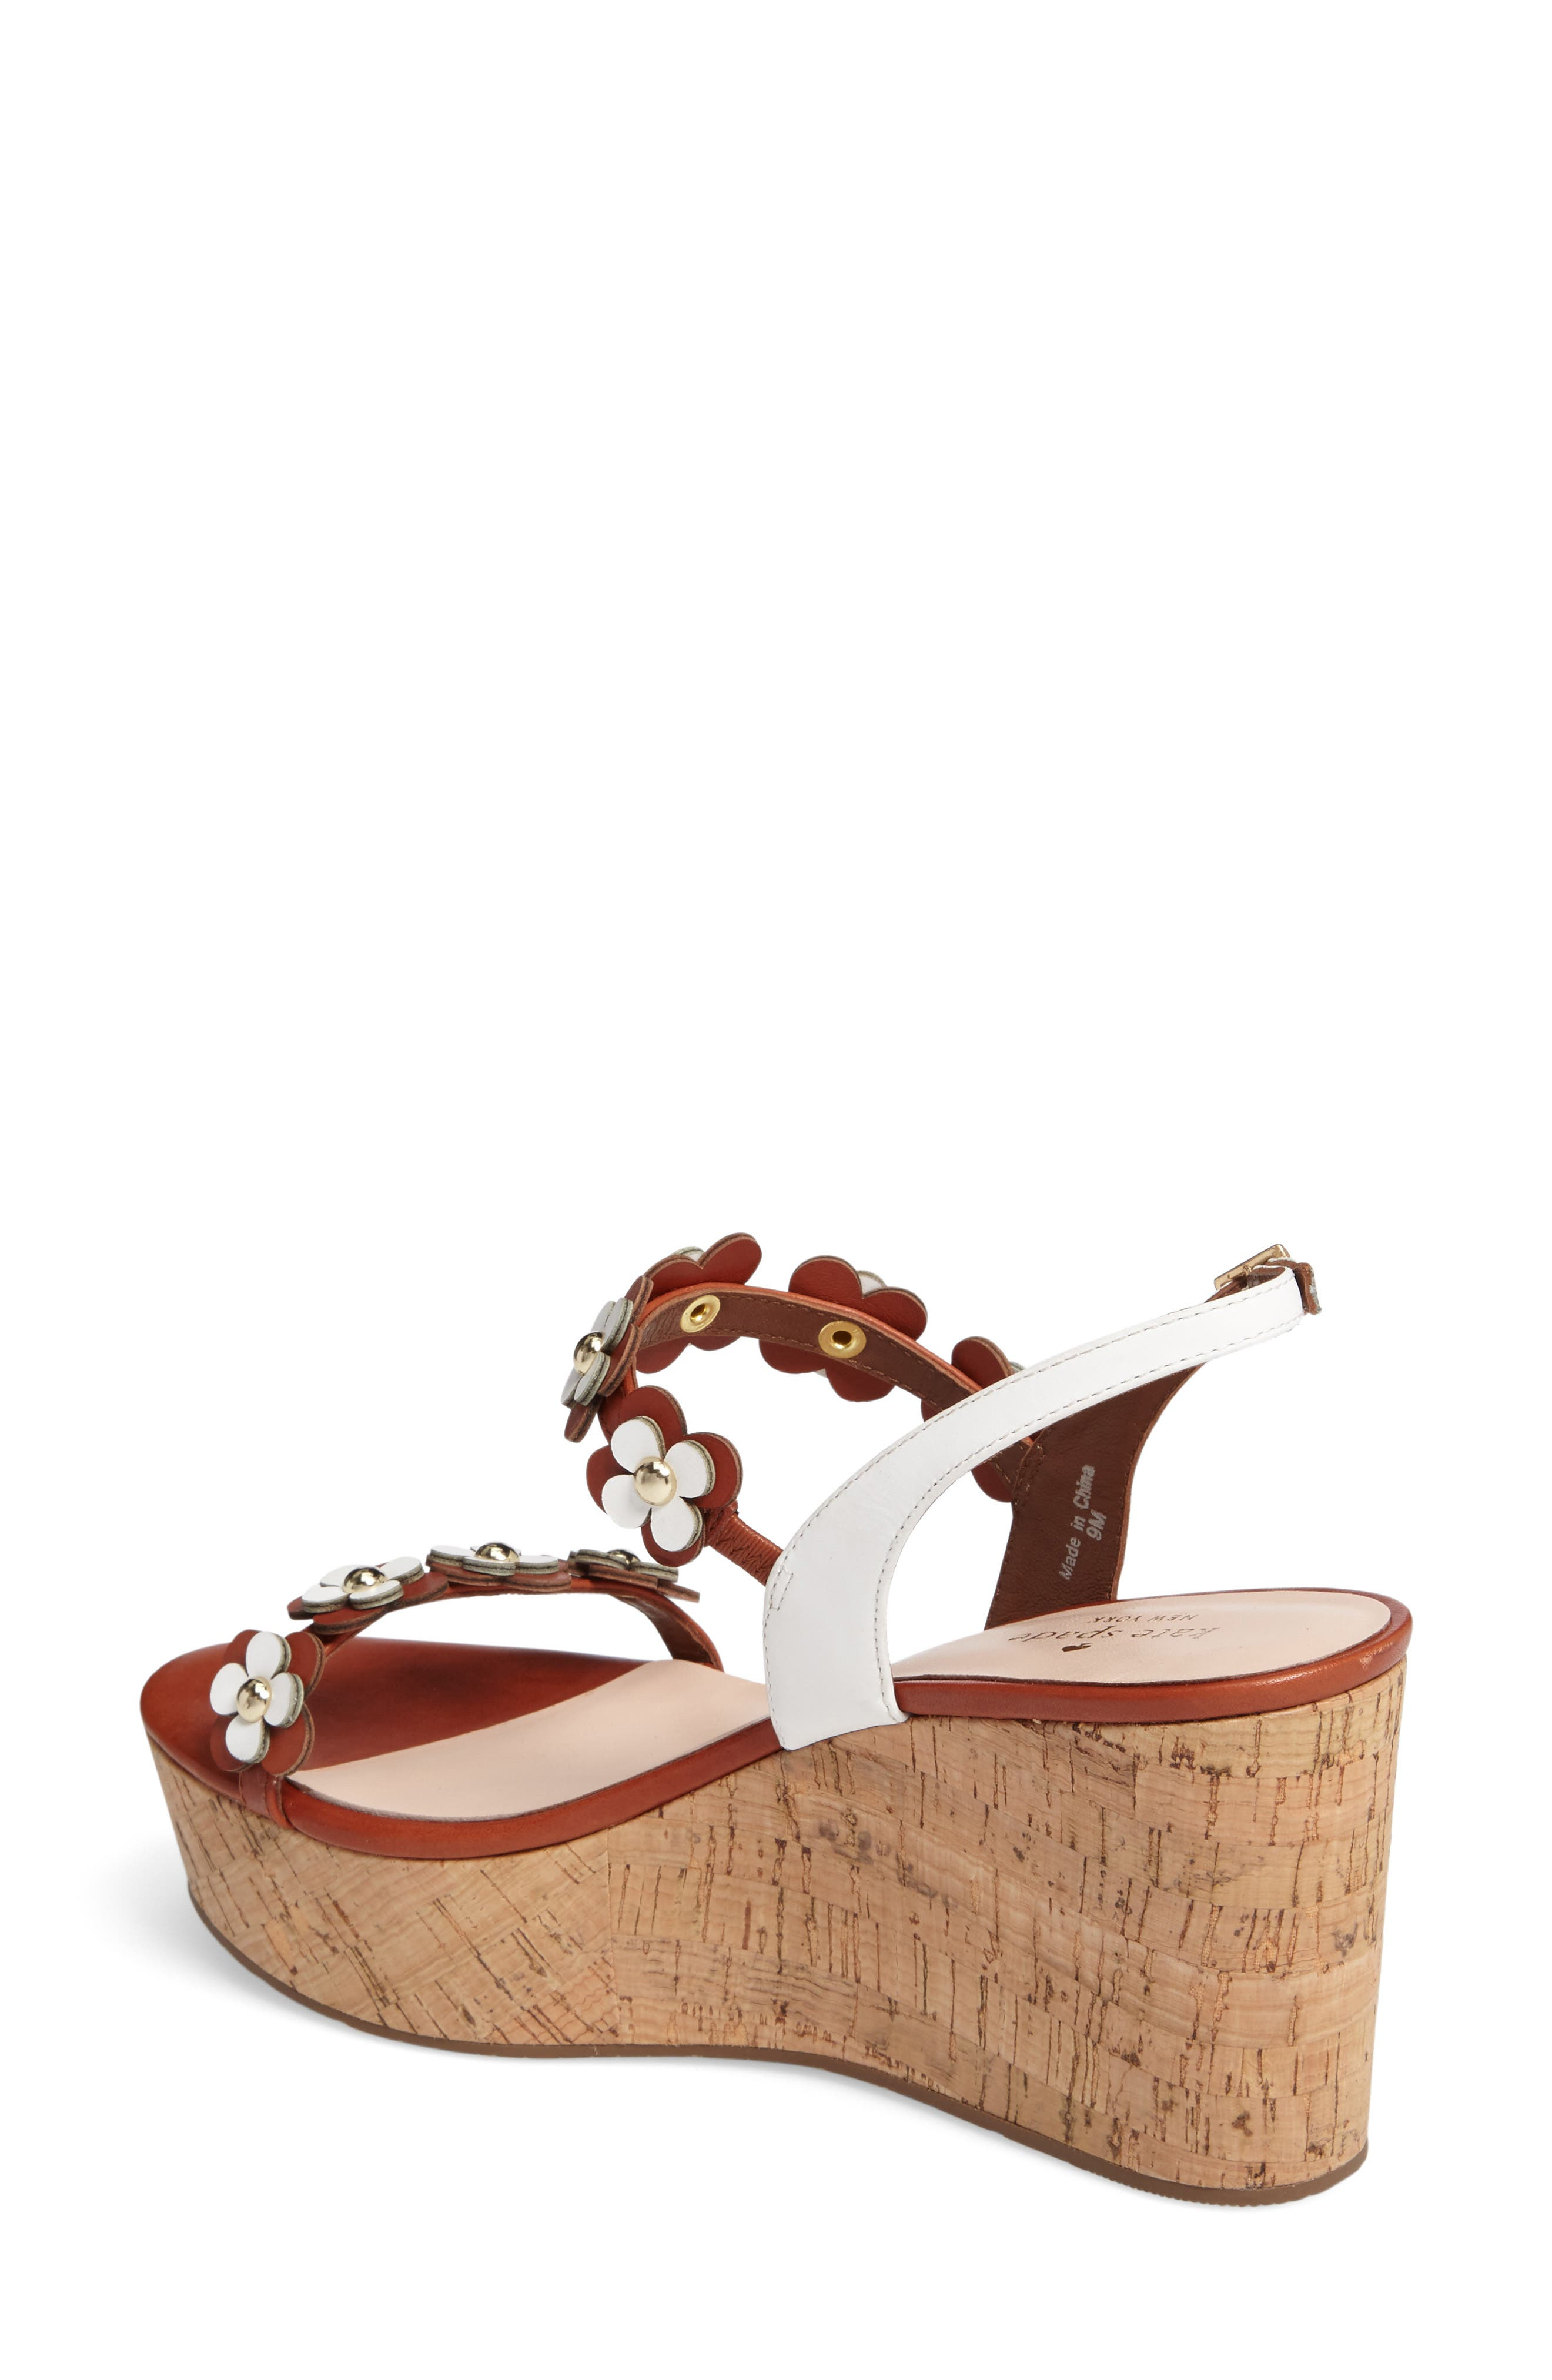 KATE SPADE NEW YORK, tisdale platform wedge sandal, Alternate thumbnail 2, color, 200